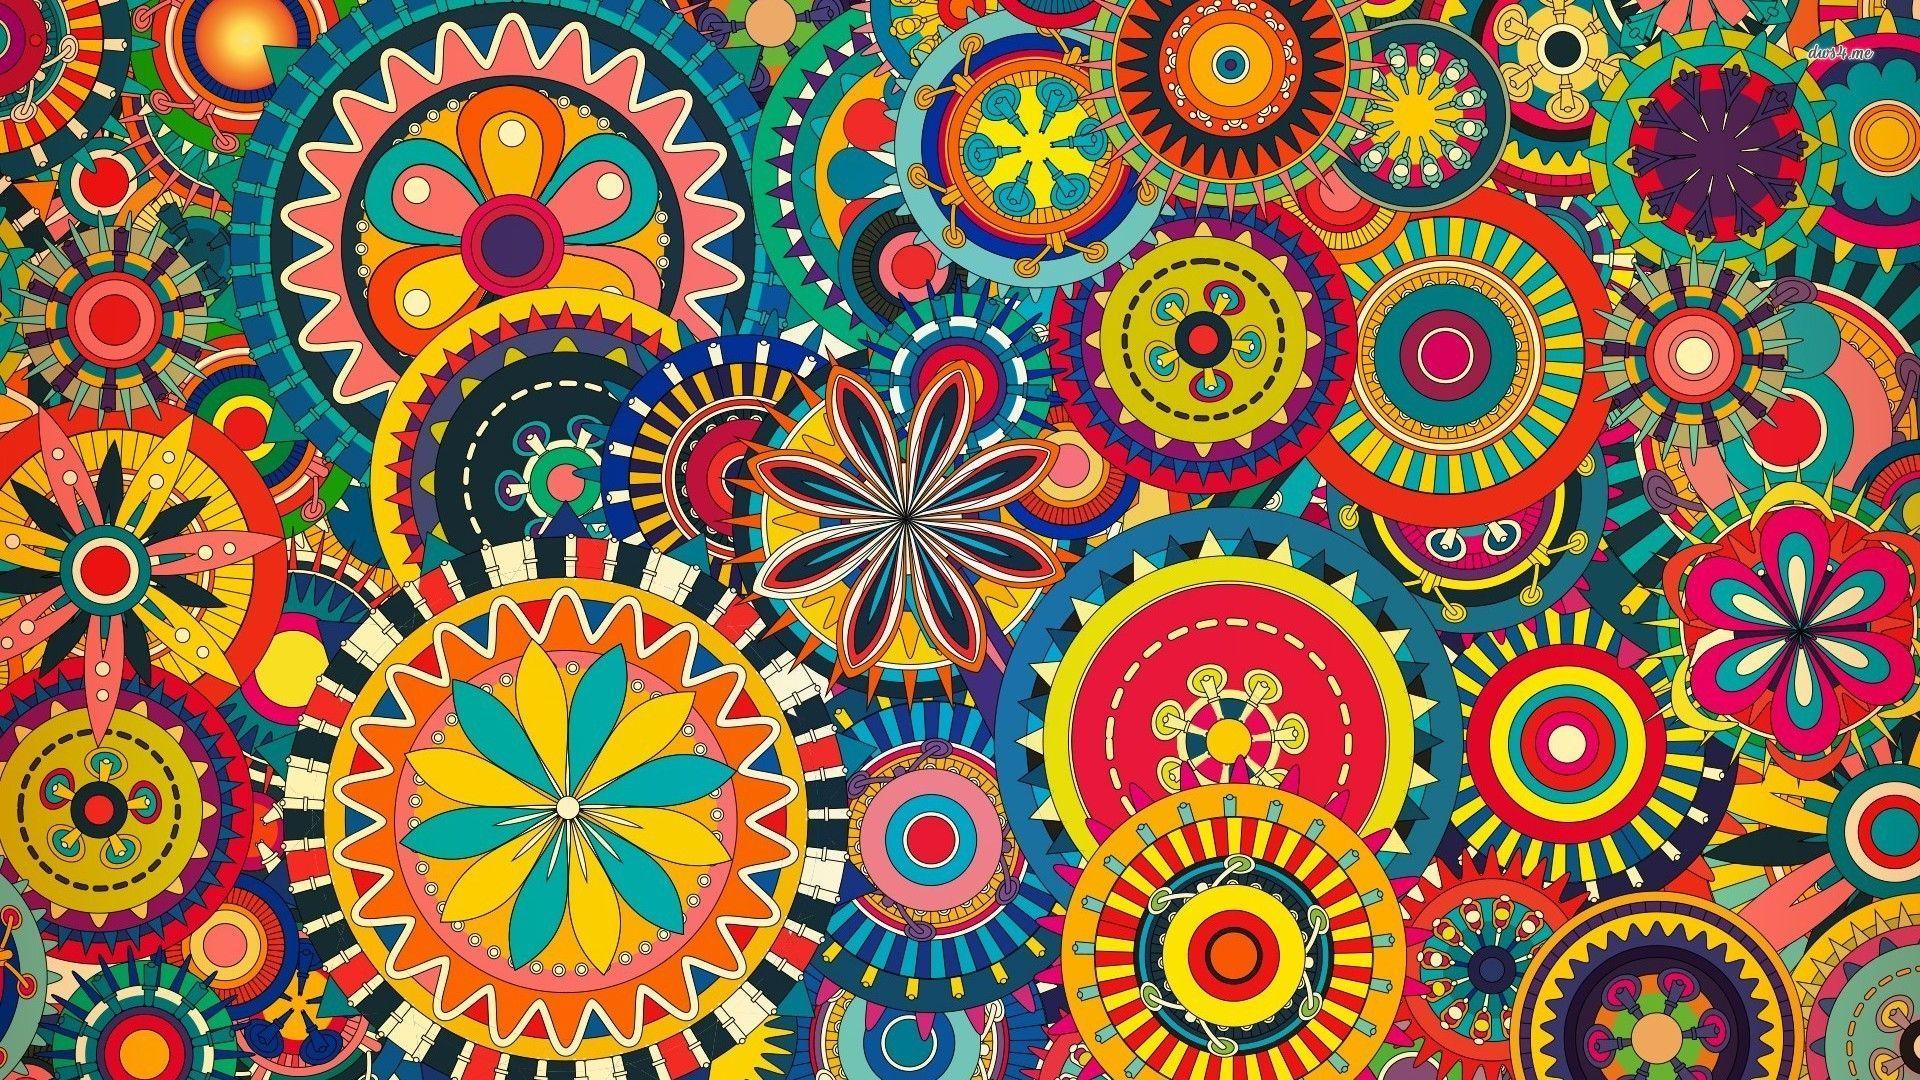 Aztec Pattern Computer Wallpapers Top Free Aztec Pattern